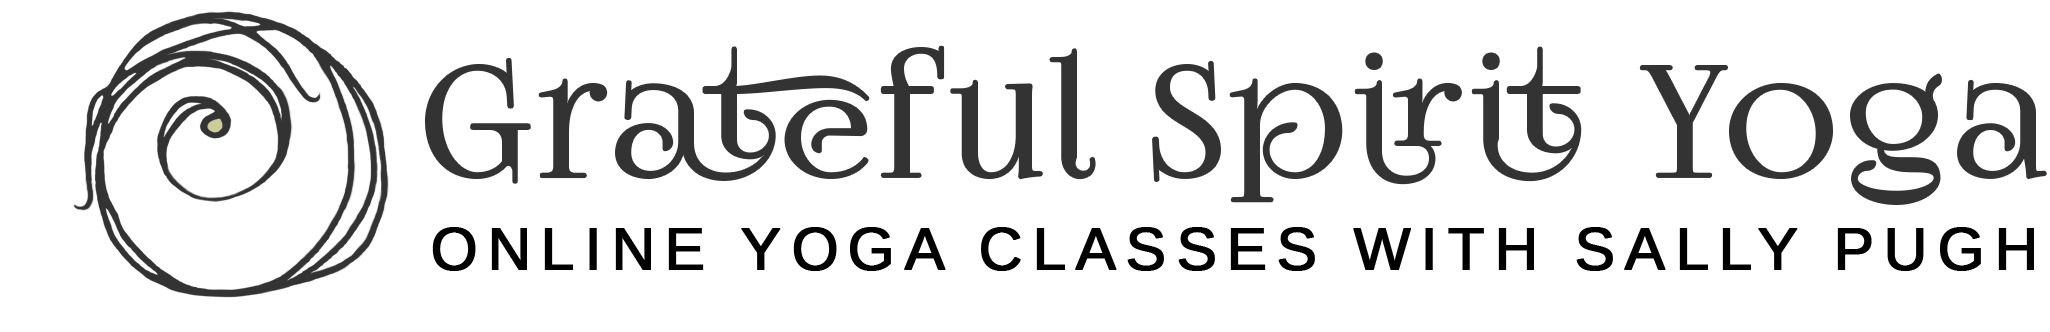 Grateful Spirit Yoga | Online Yoga Classes with Sally Pugh